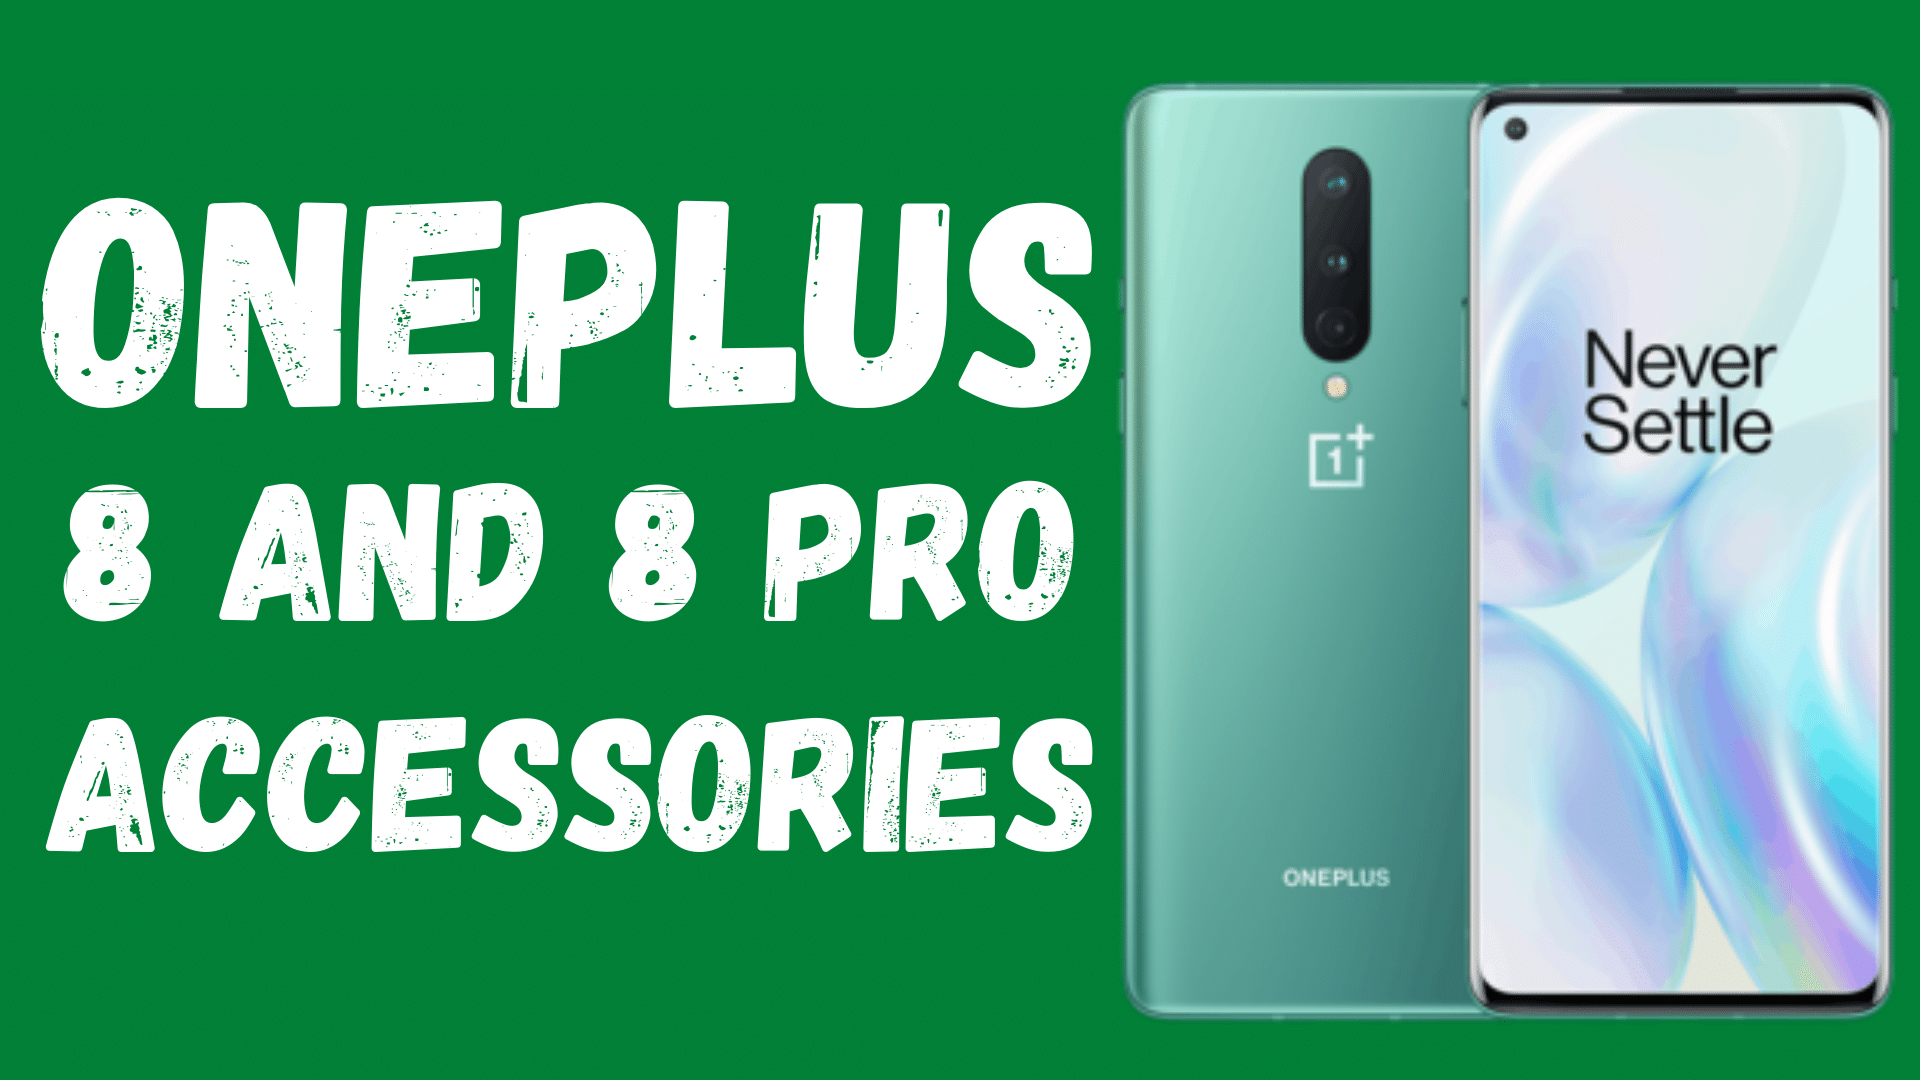 OnePlus 8 Pro accessories